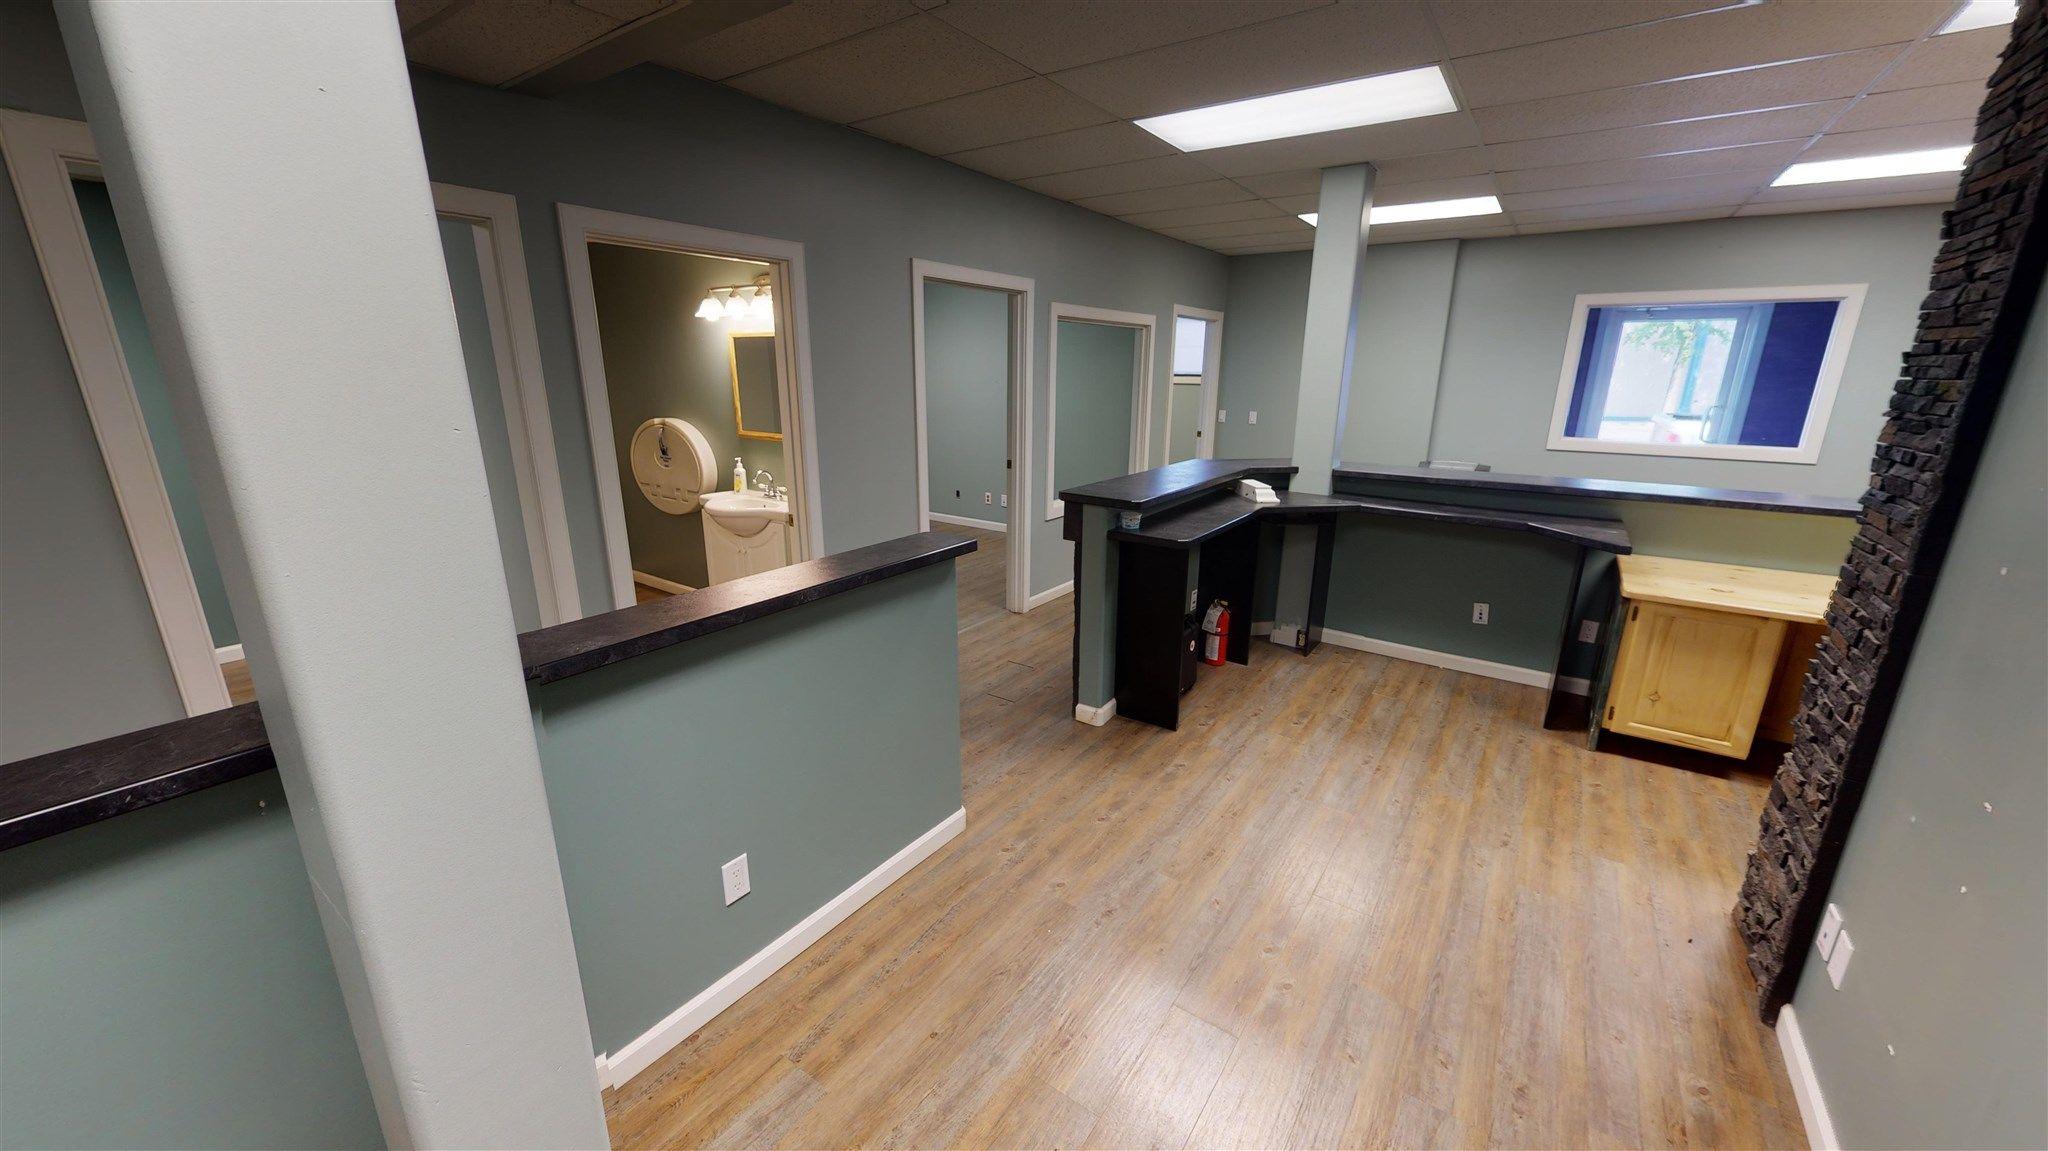 Photo 10: Photos: 10067 100 Avenue in Fort St. John: Fort St. John - City NW Office for sale (Fort St. John (Zone 60))  : MLS®# C8039097